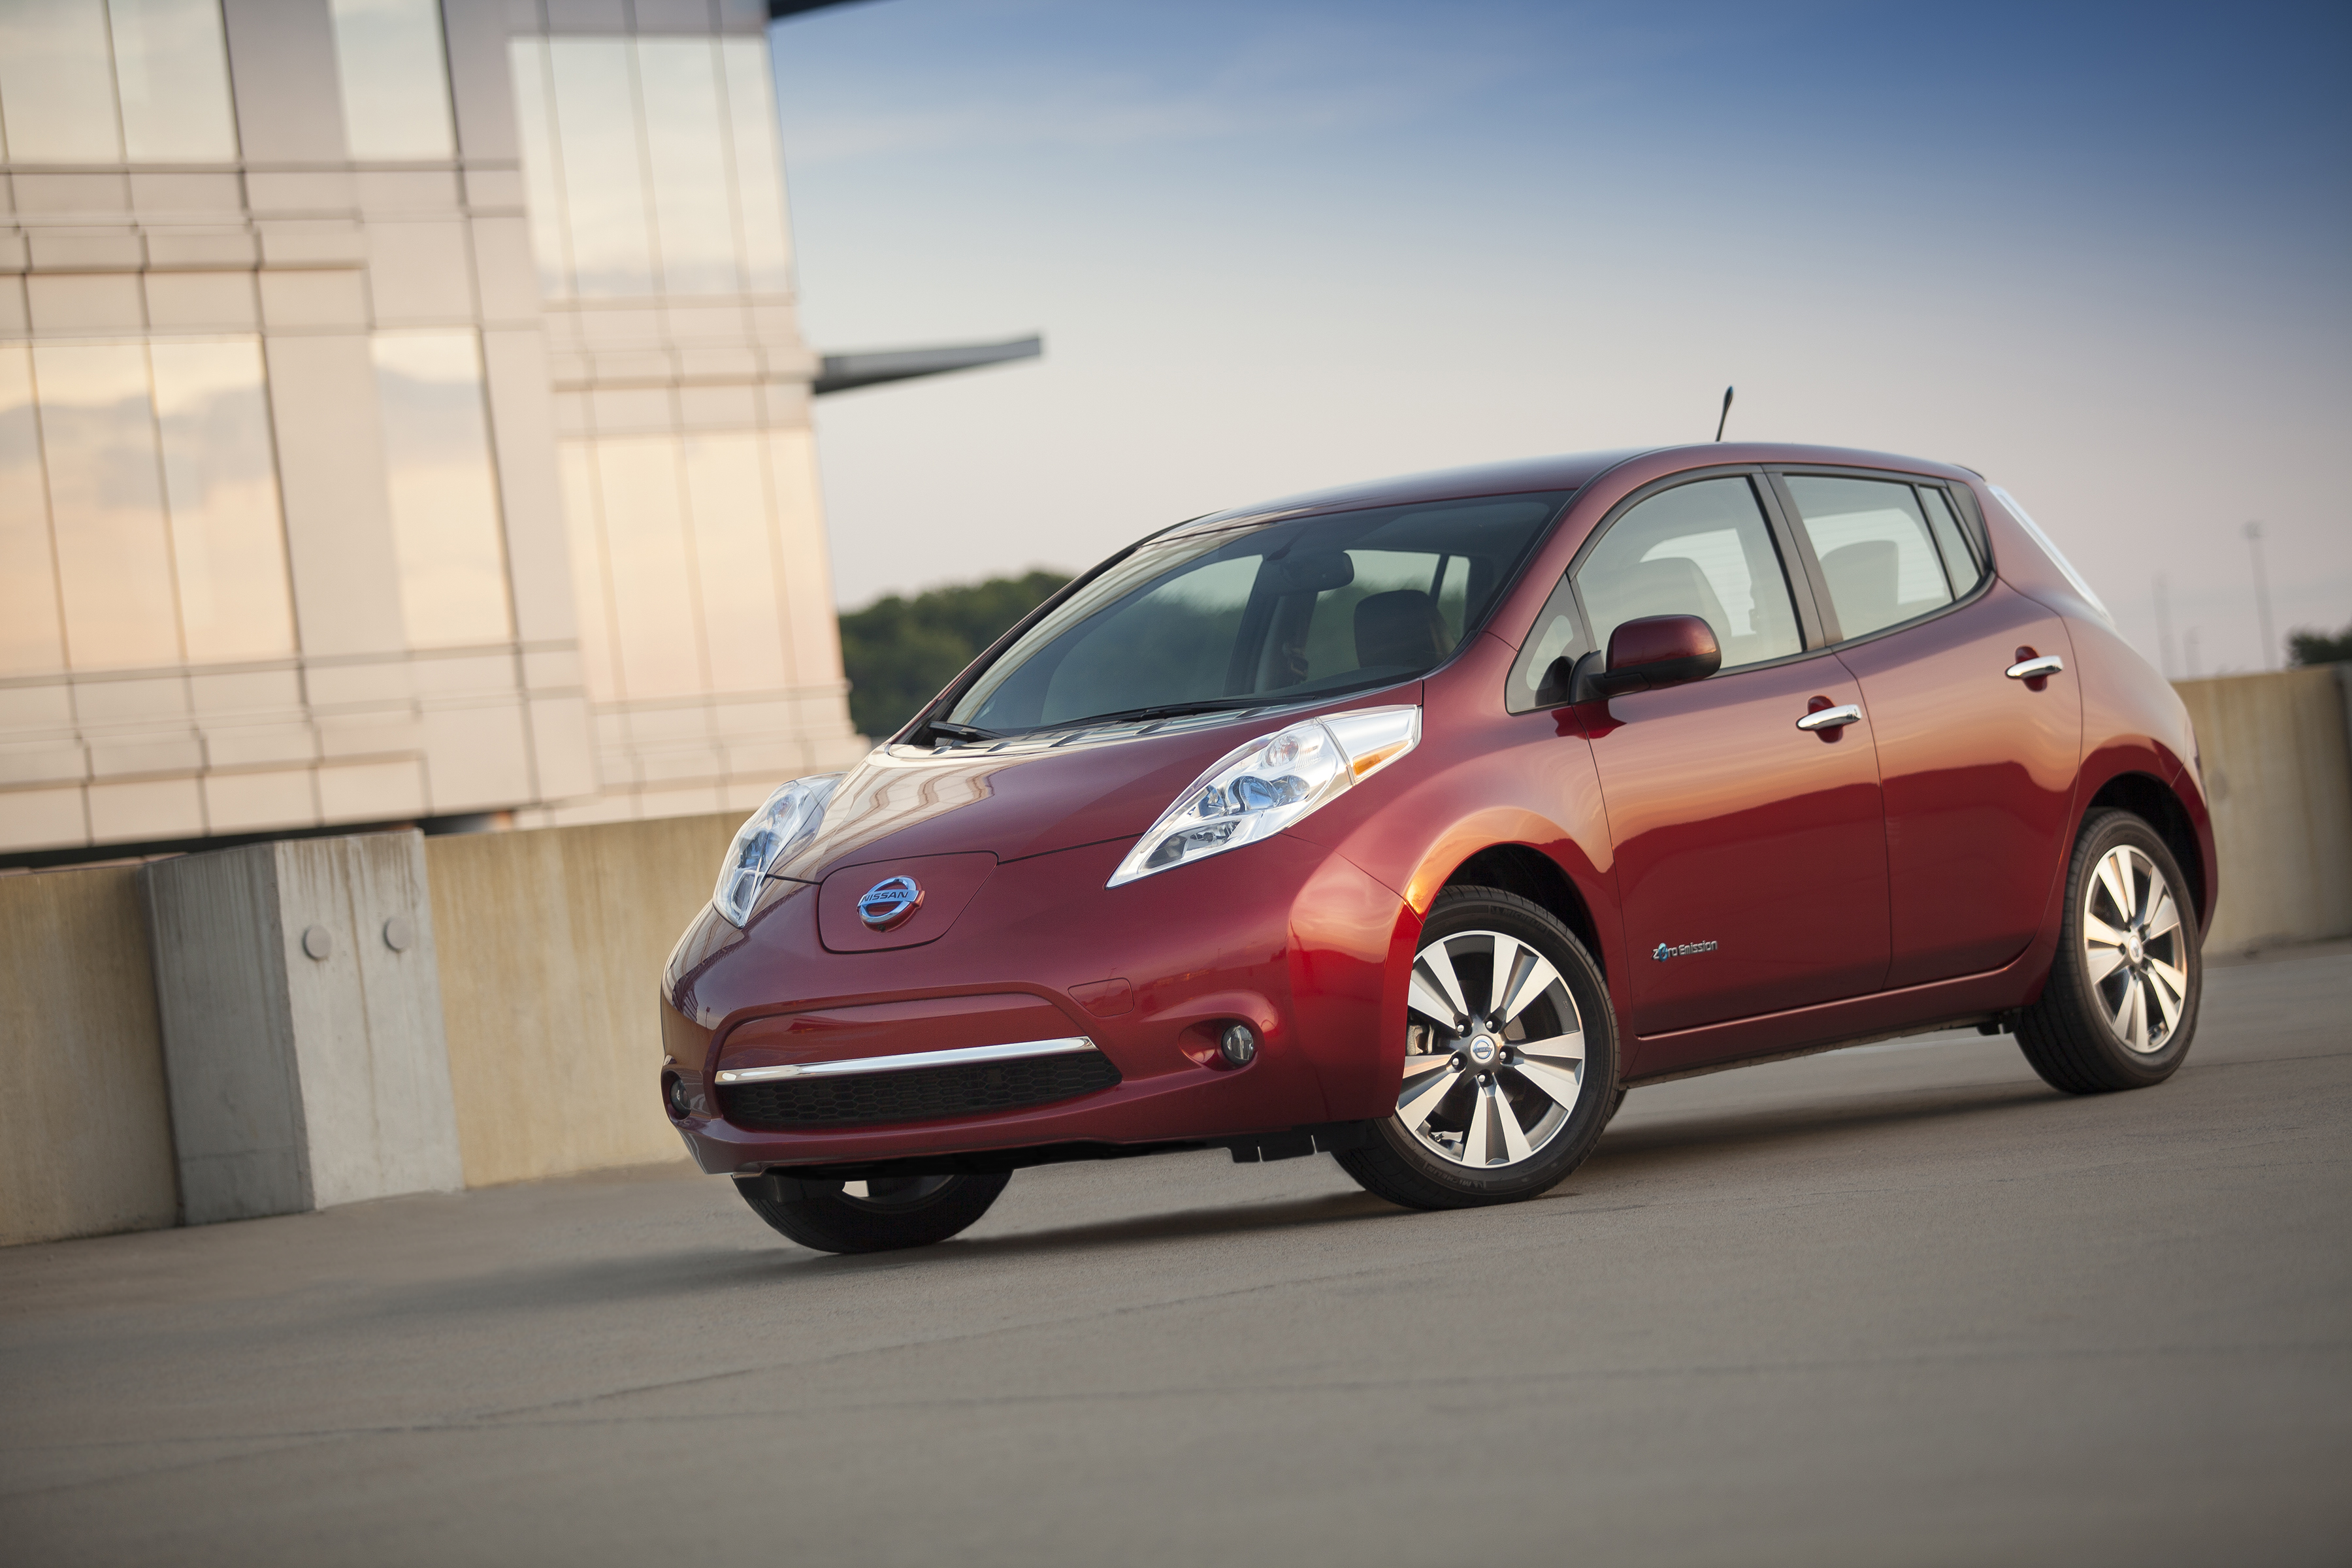 Nissan LEAF Reaches 1B Kilometers Driven